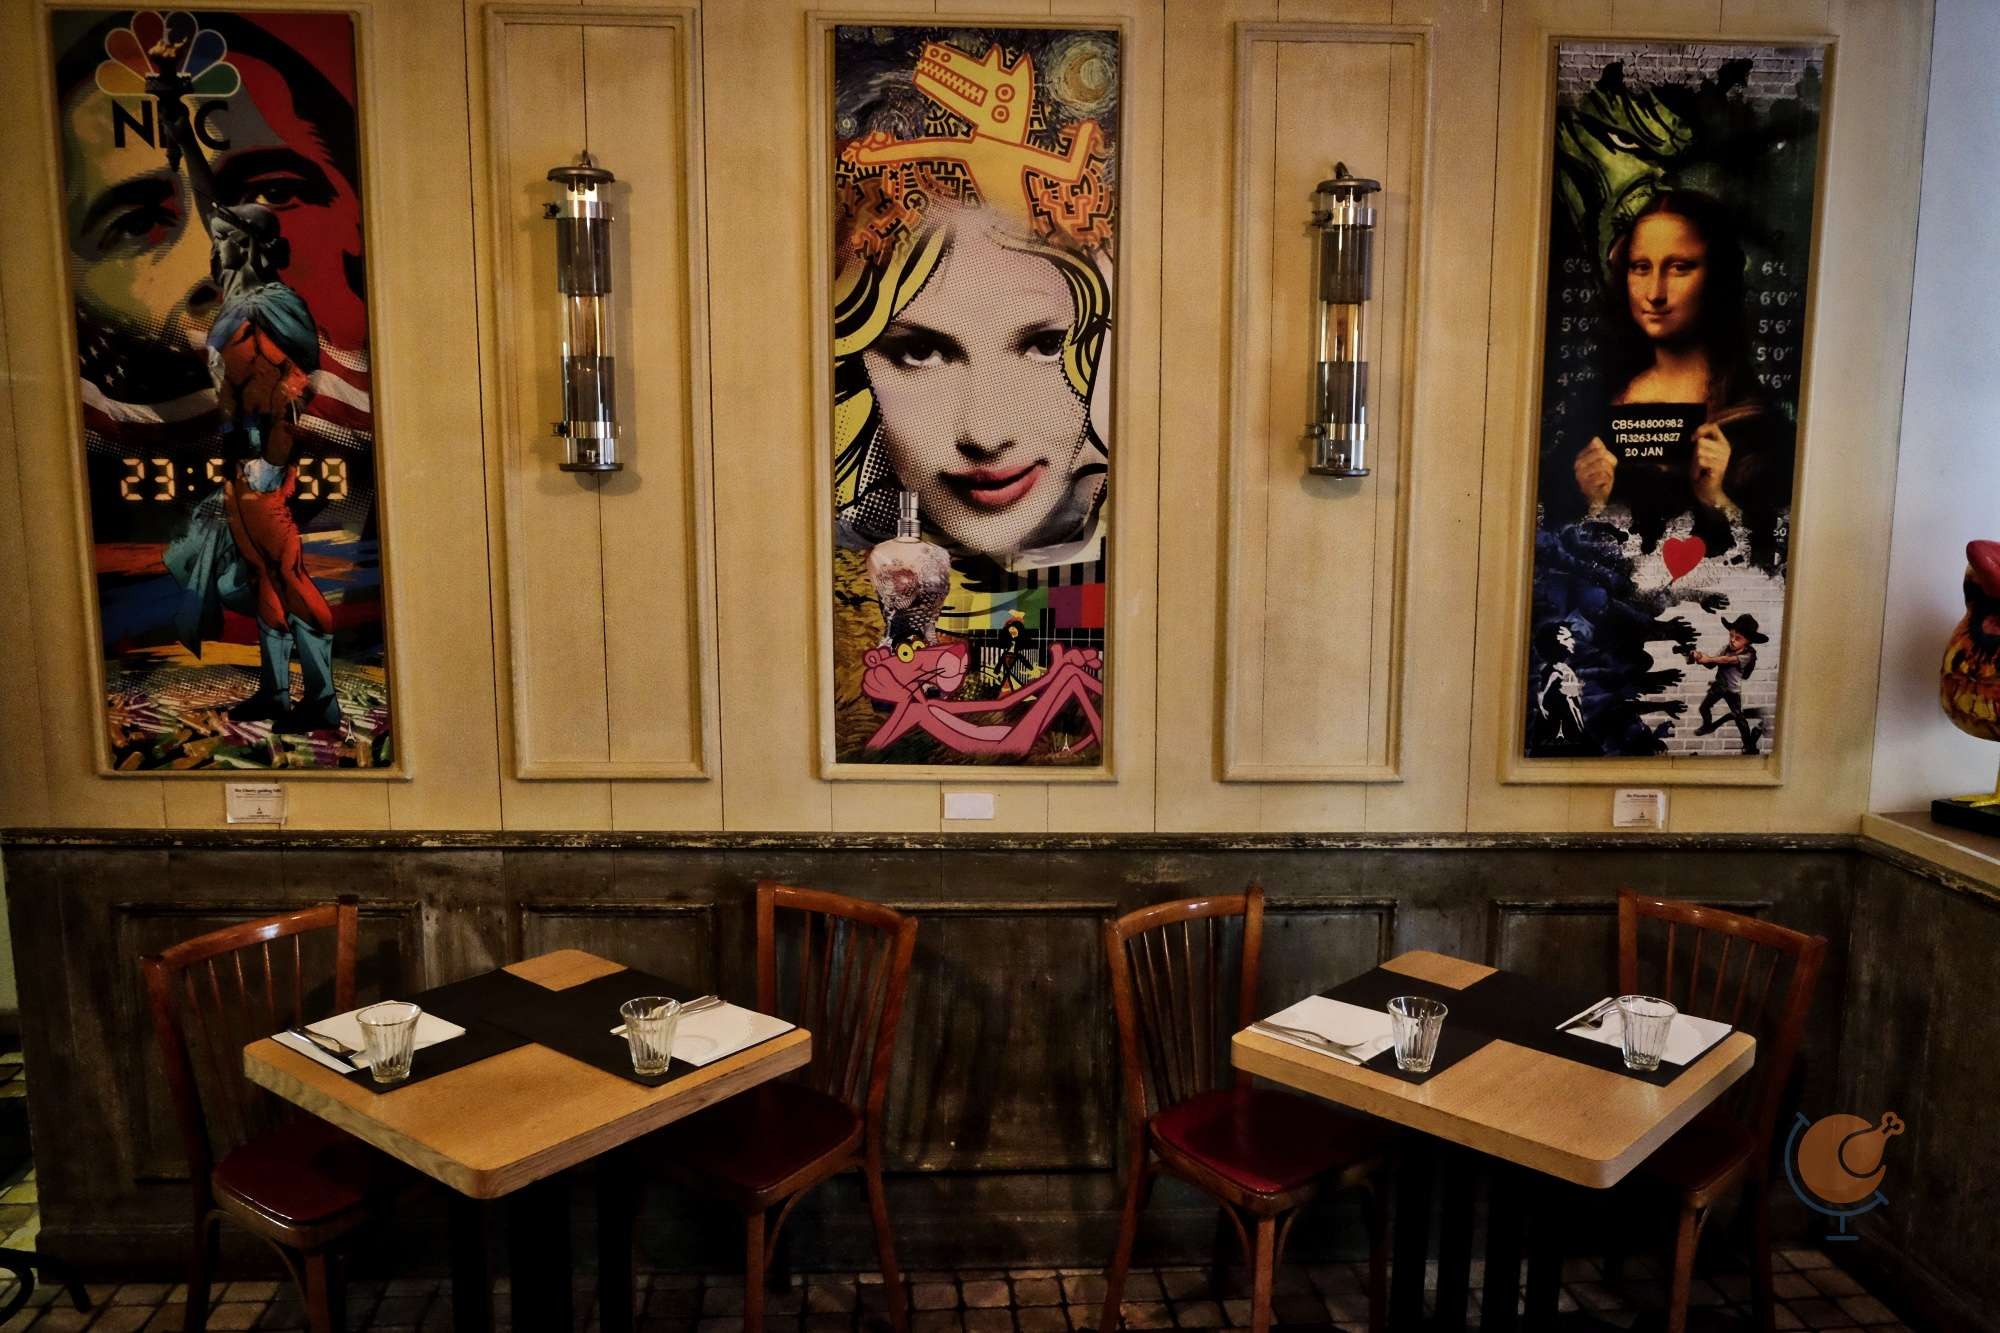 dscf1416_bar_des_oiseaux_restaurant_france_nice_nizza_vilagevo_jokuti_andras_l_w.jpg